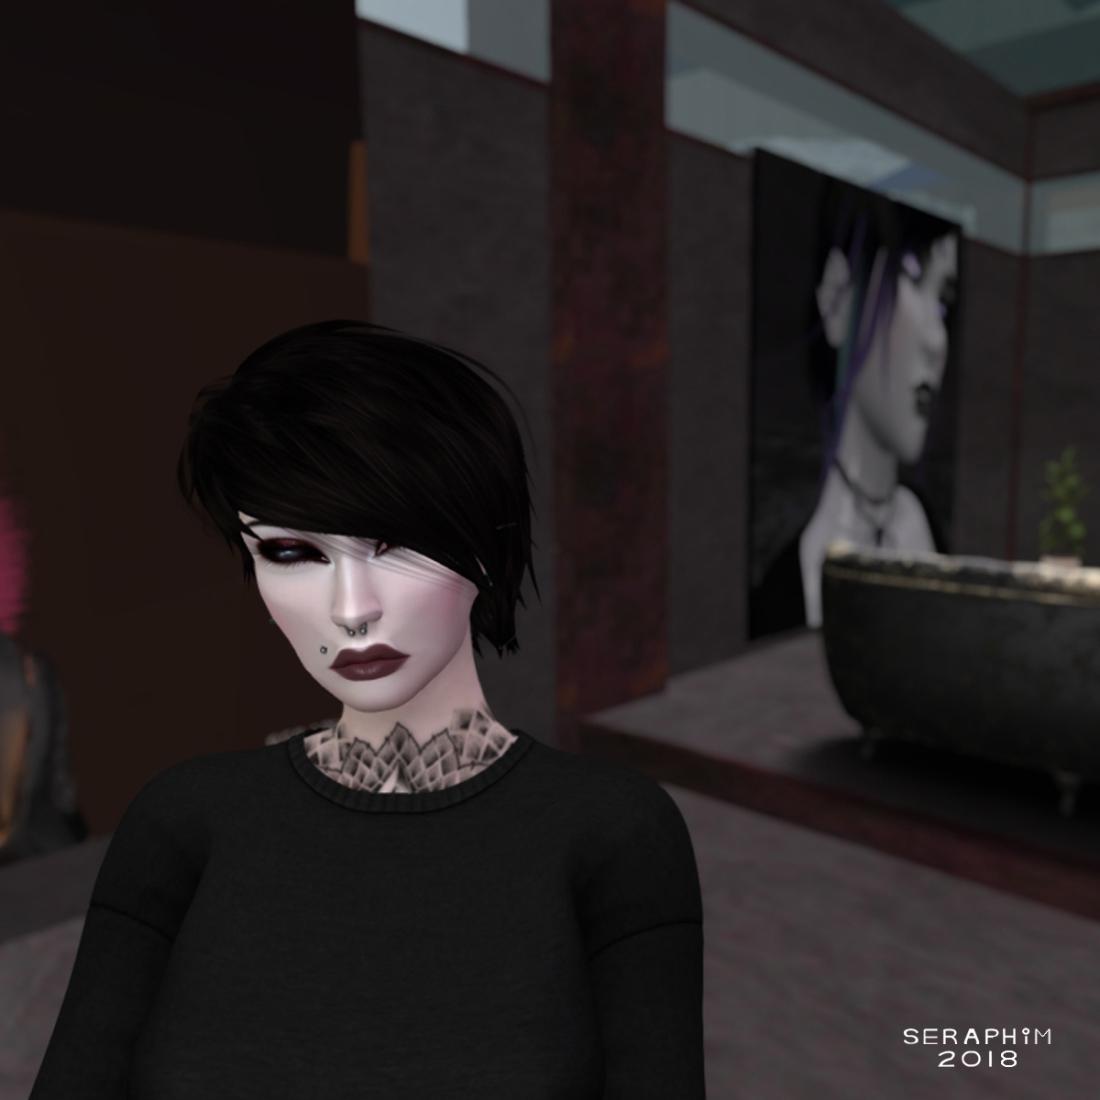 GalleryGirl2a